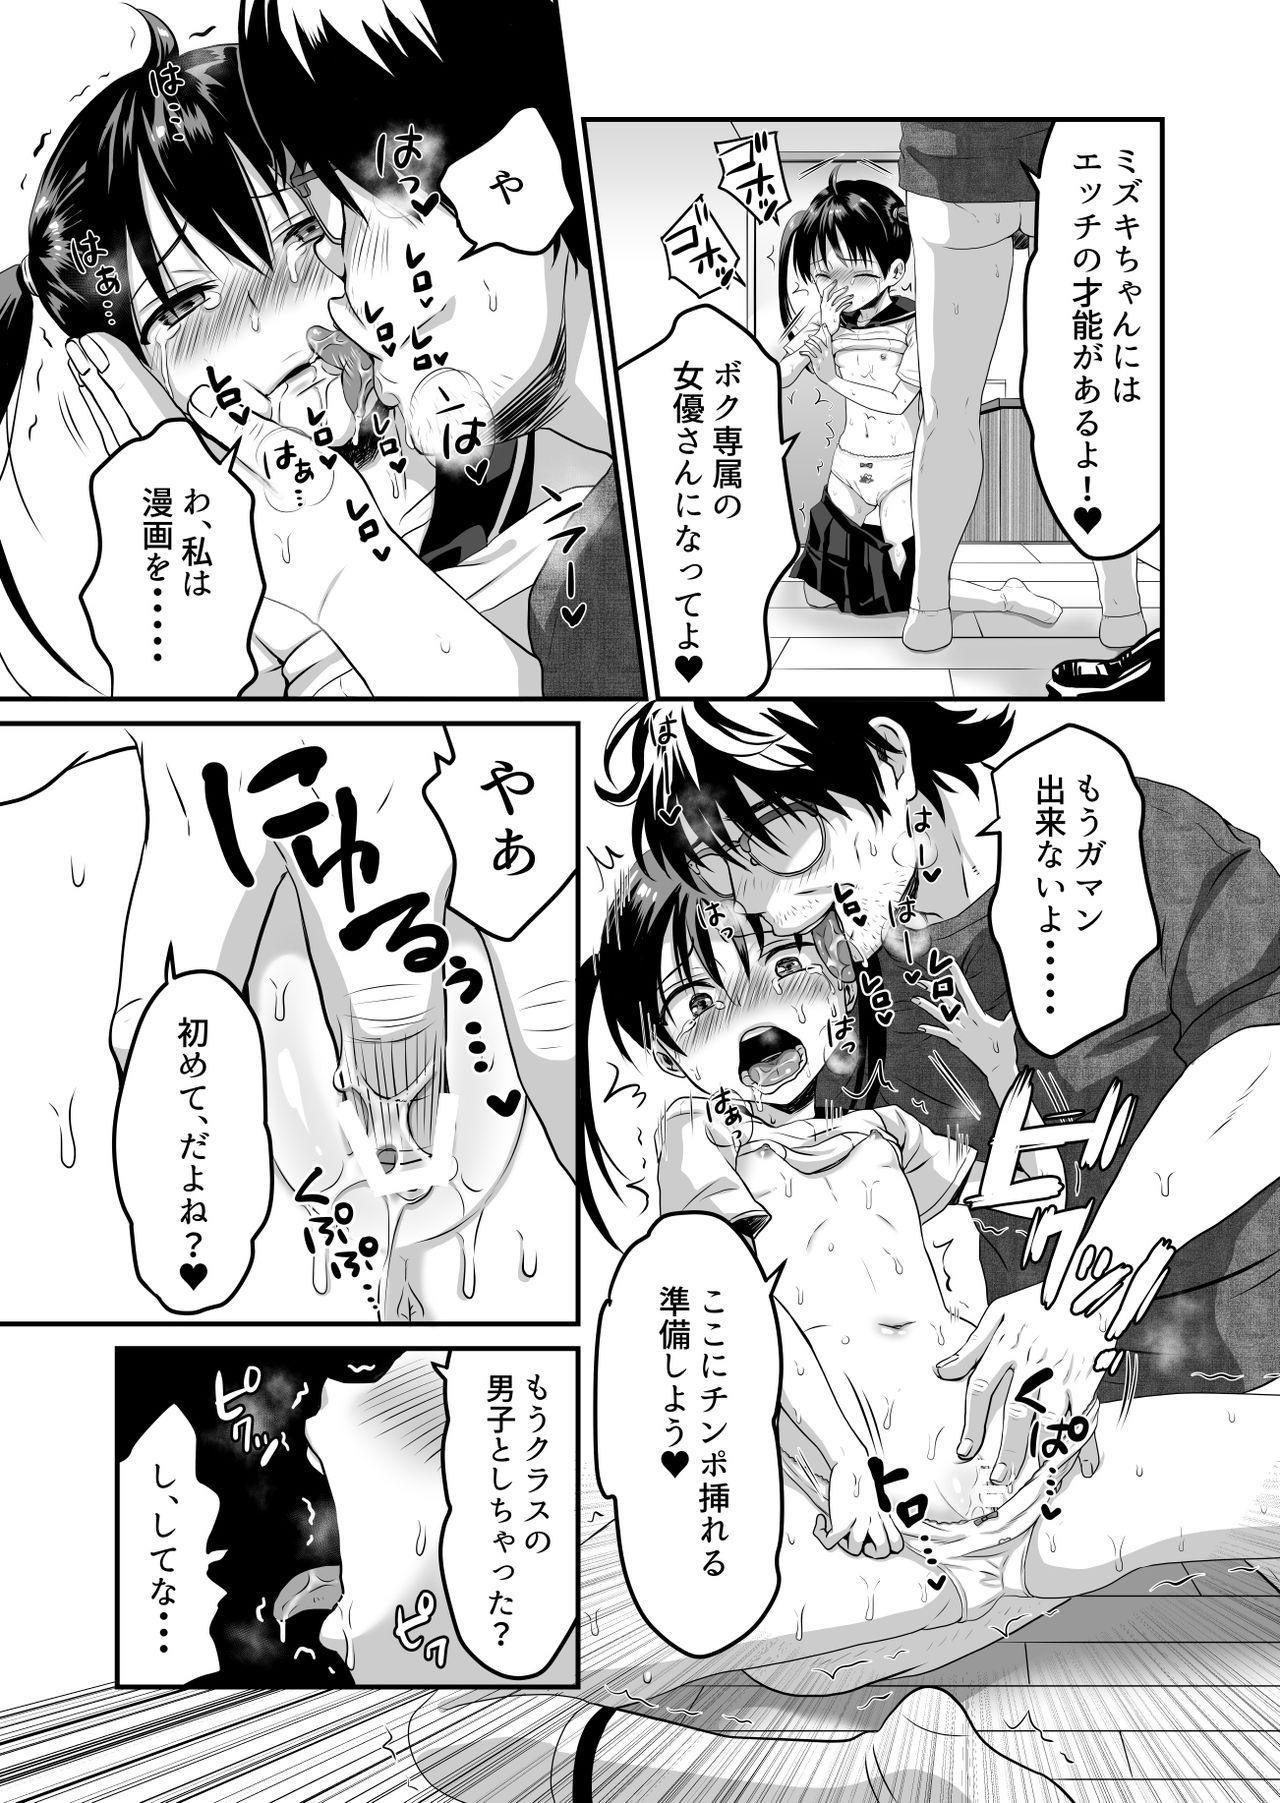 Otonari-san wa AV Danyuu 21